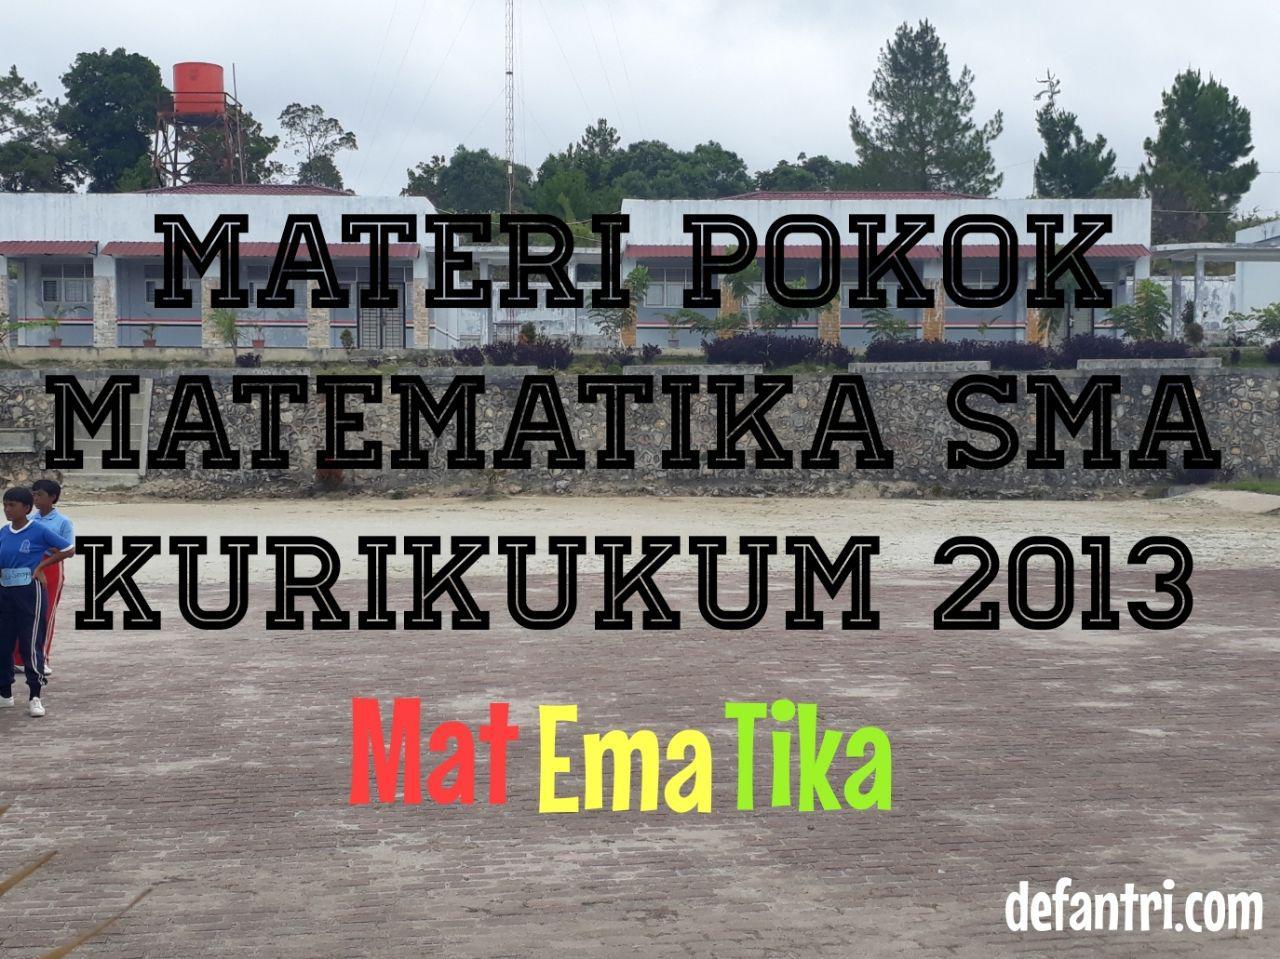 Urutan Materi Pokok Pembelajaran Matematika SMA Kurikulum 2013